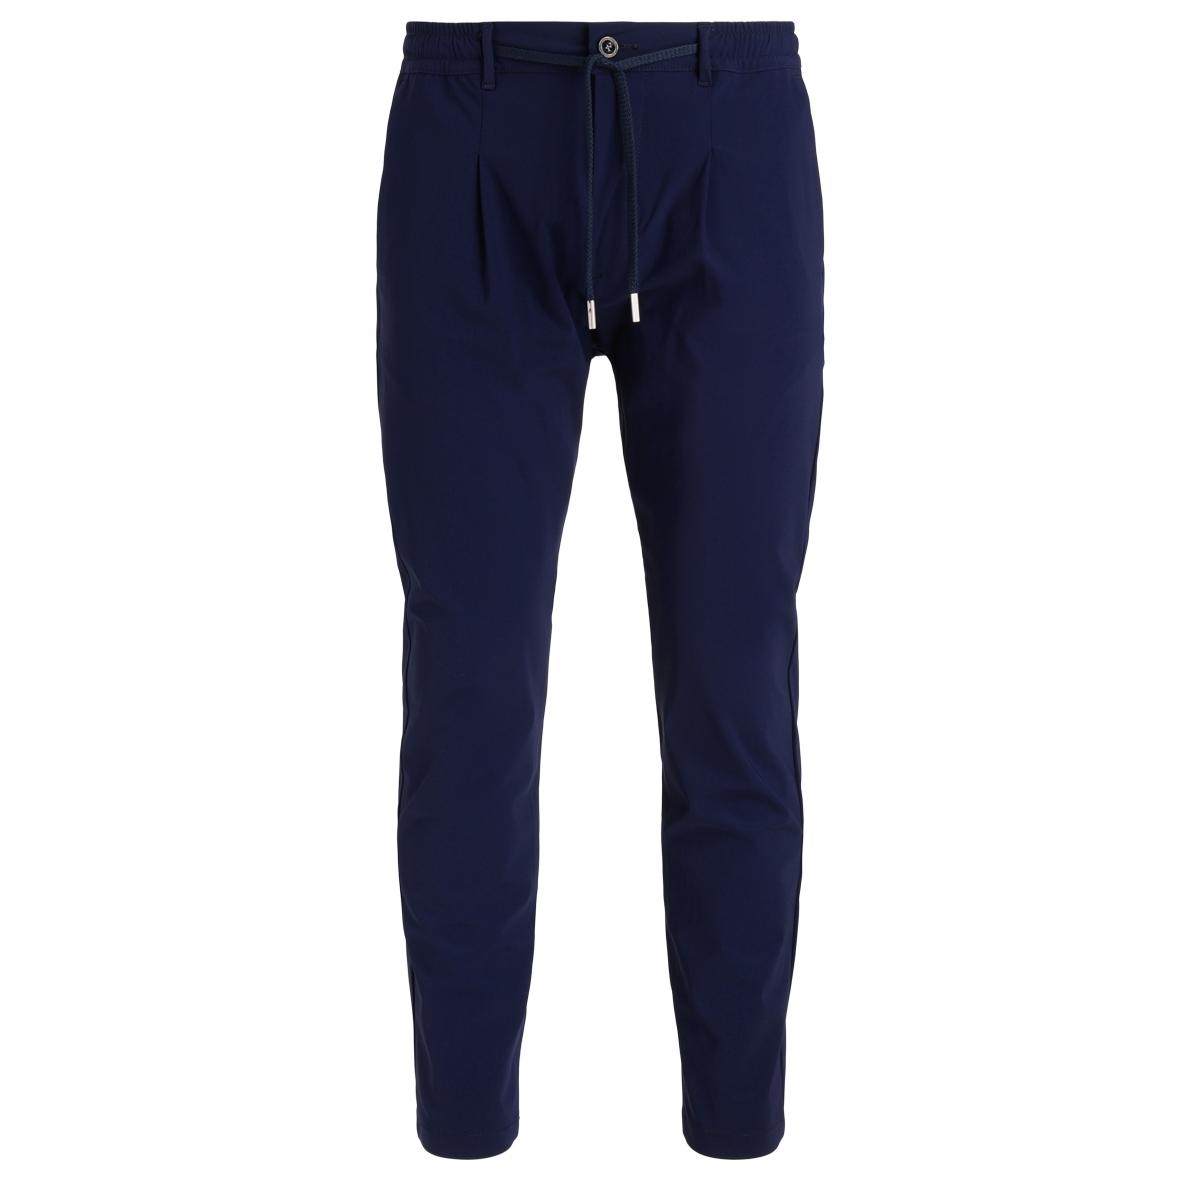 Pantalon Mitte en jersey technique bleu - CRUNA - Modalova